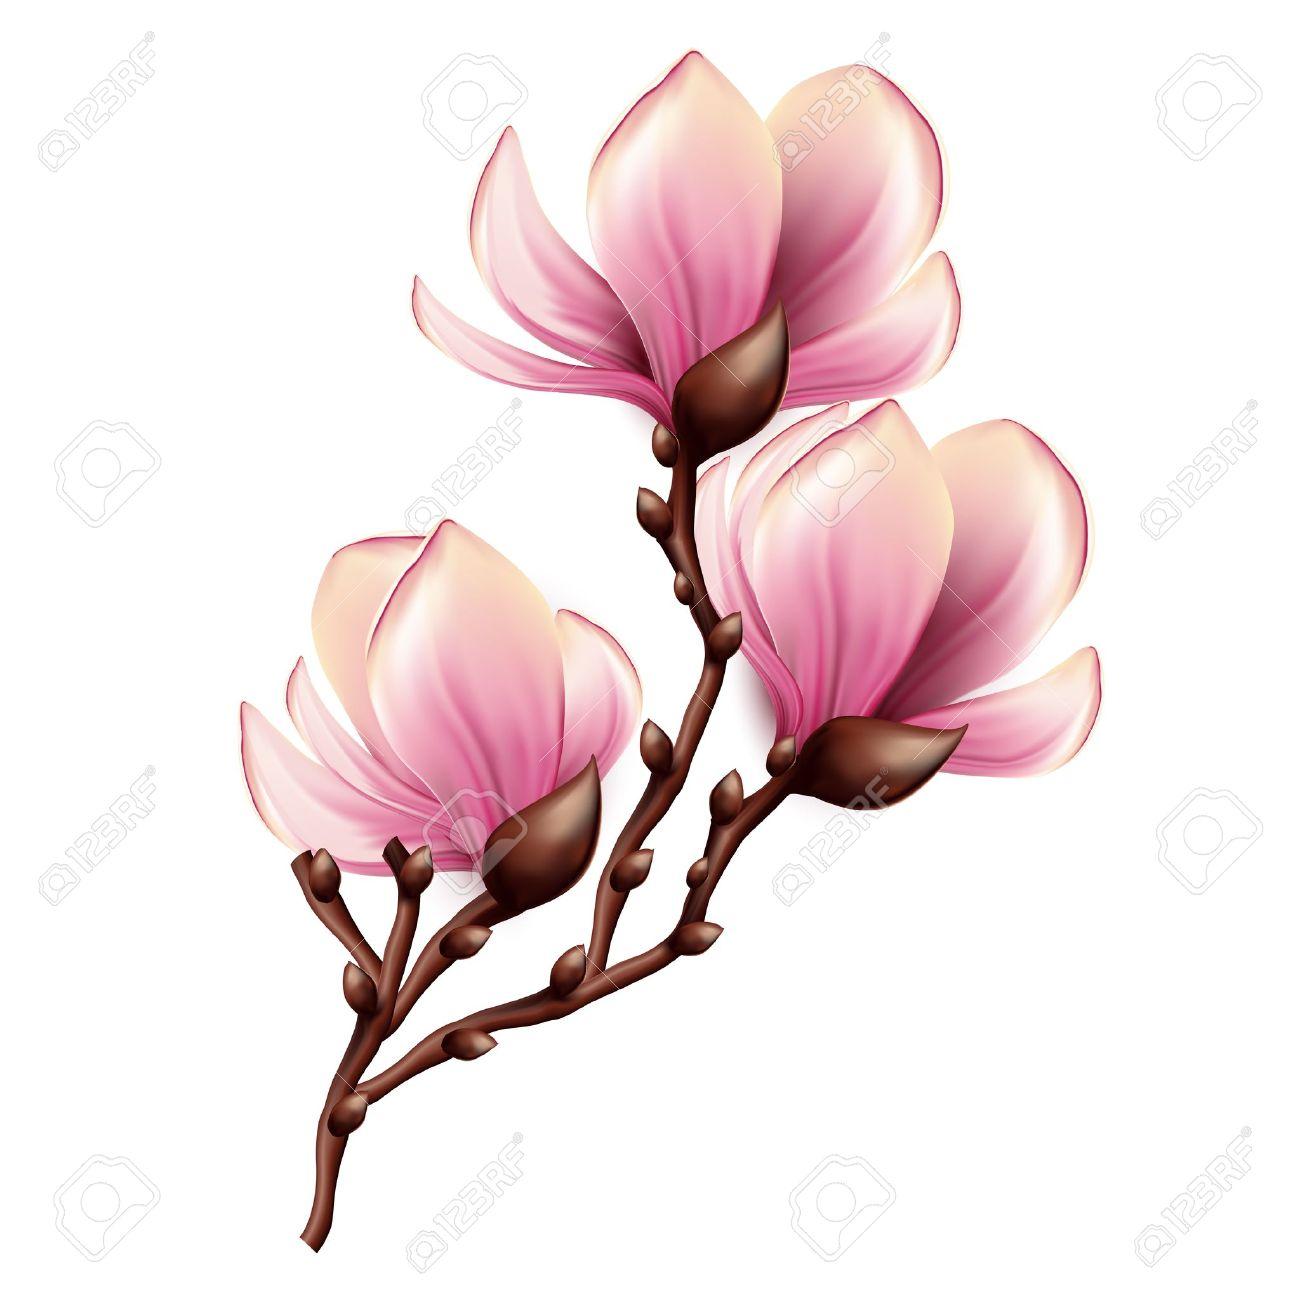 4 906 magnolia stock vector illustration and royalty free magnolia rh 123rf com magnolia clipart black and white magnolia market clipart